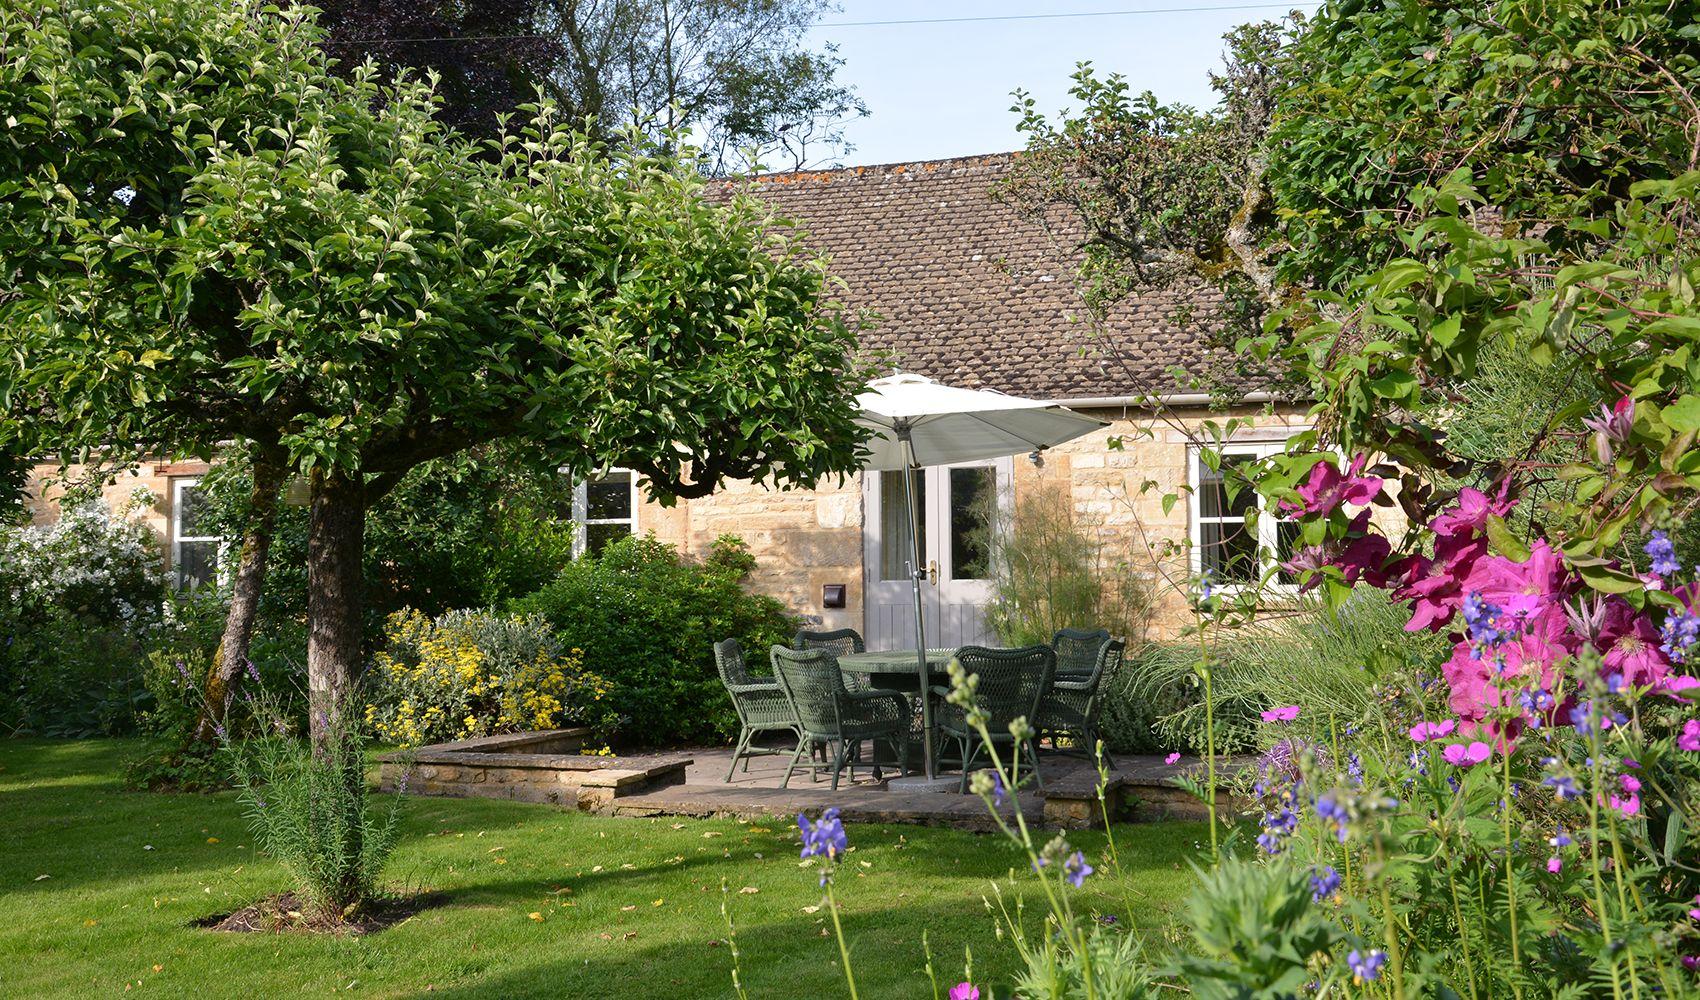 Big orchard garden with lawn & borders: garden furniture, umbrella & BBQ